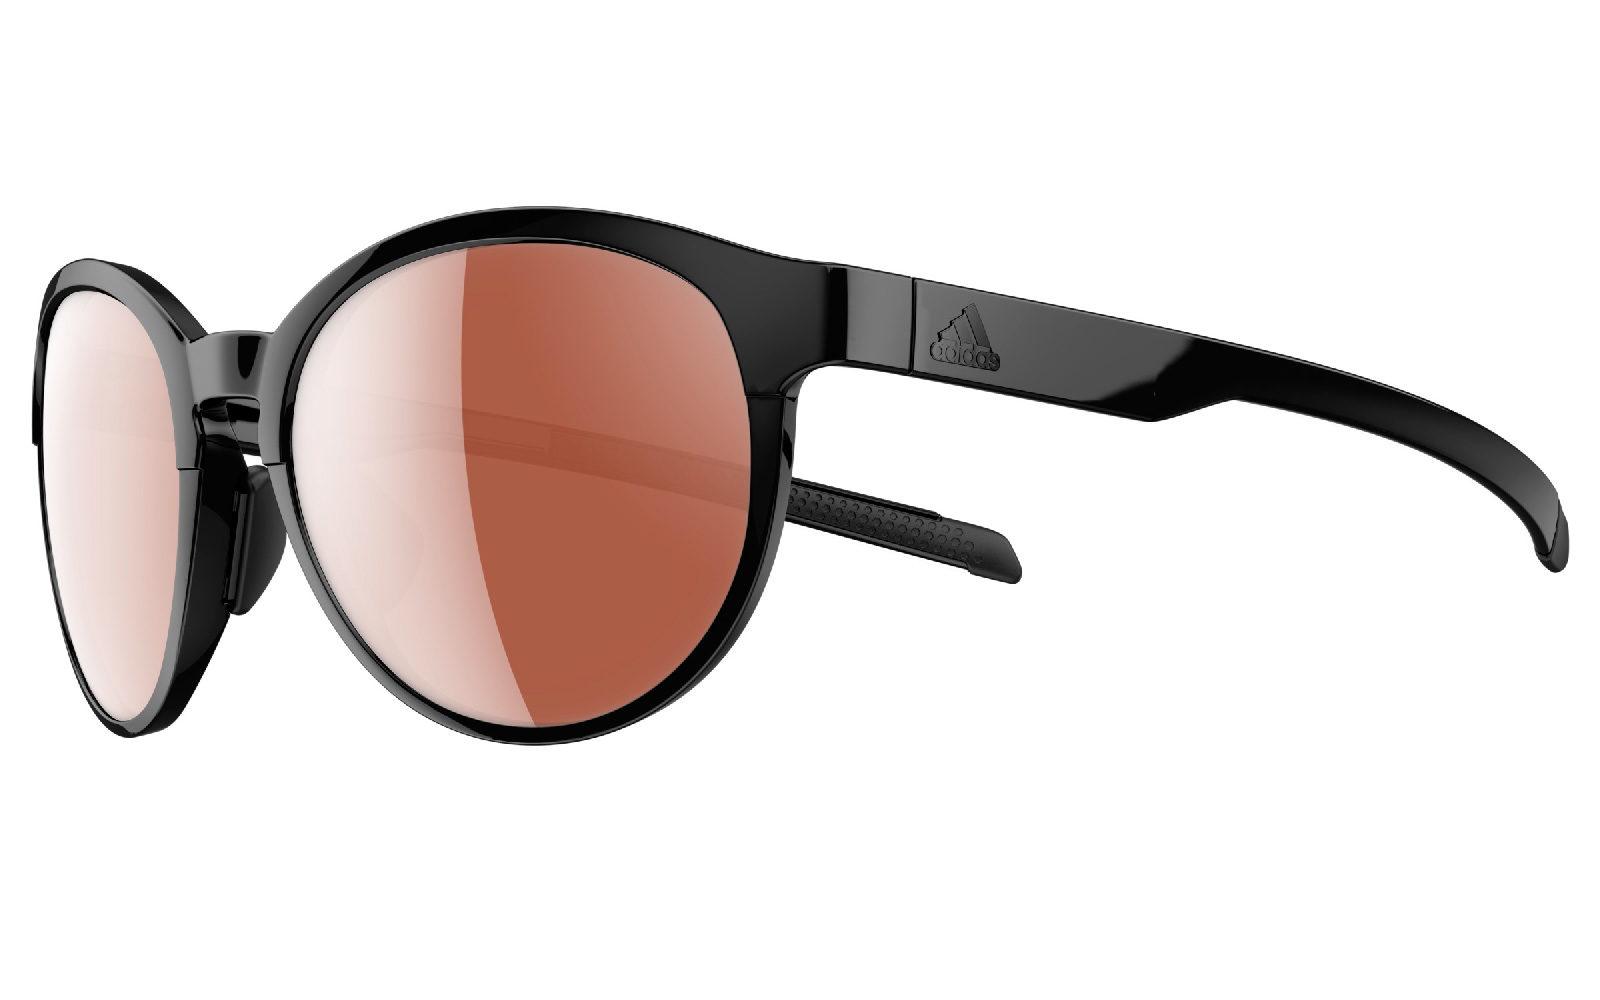 Adidas Eyewear Beyonder, con montatura elegante e leggera, non si muovono grazie ai grip antiscivolo sulle astine e ai naselli regolabili, euro 109